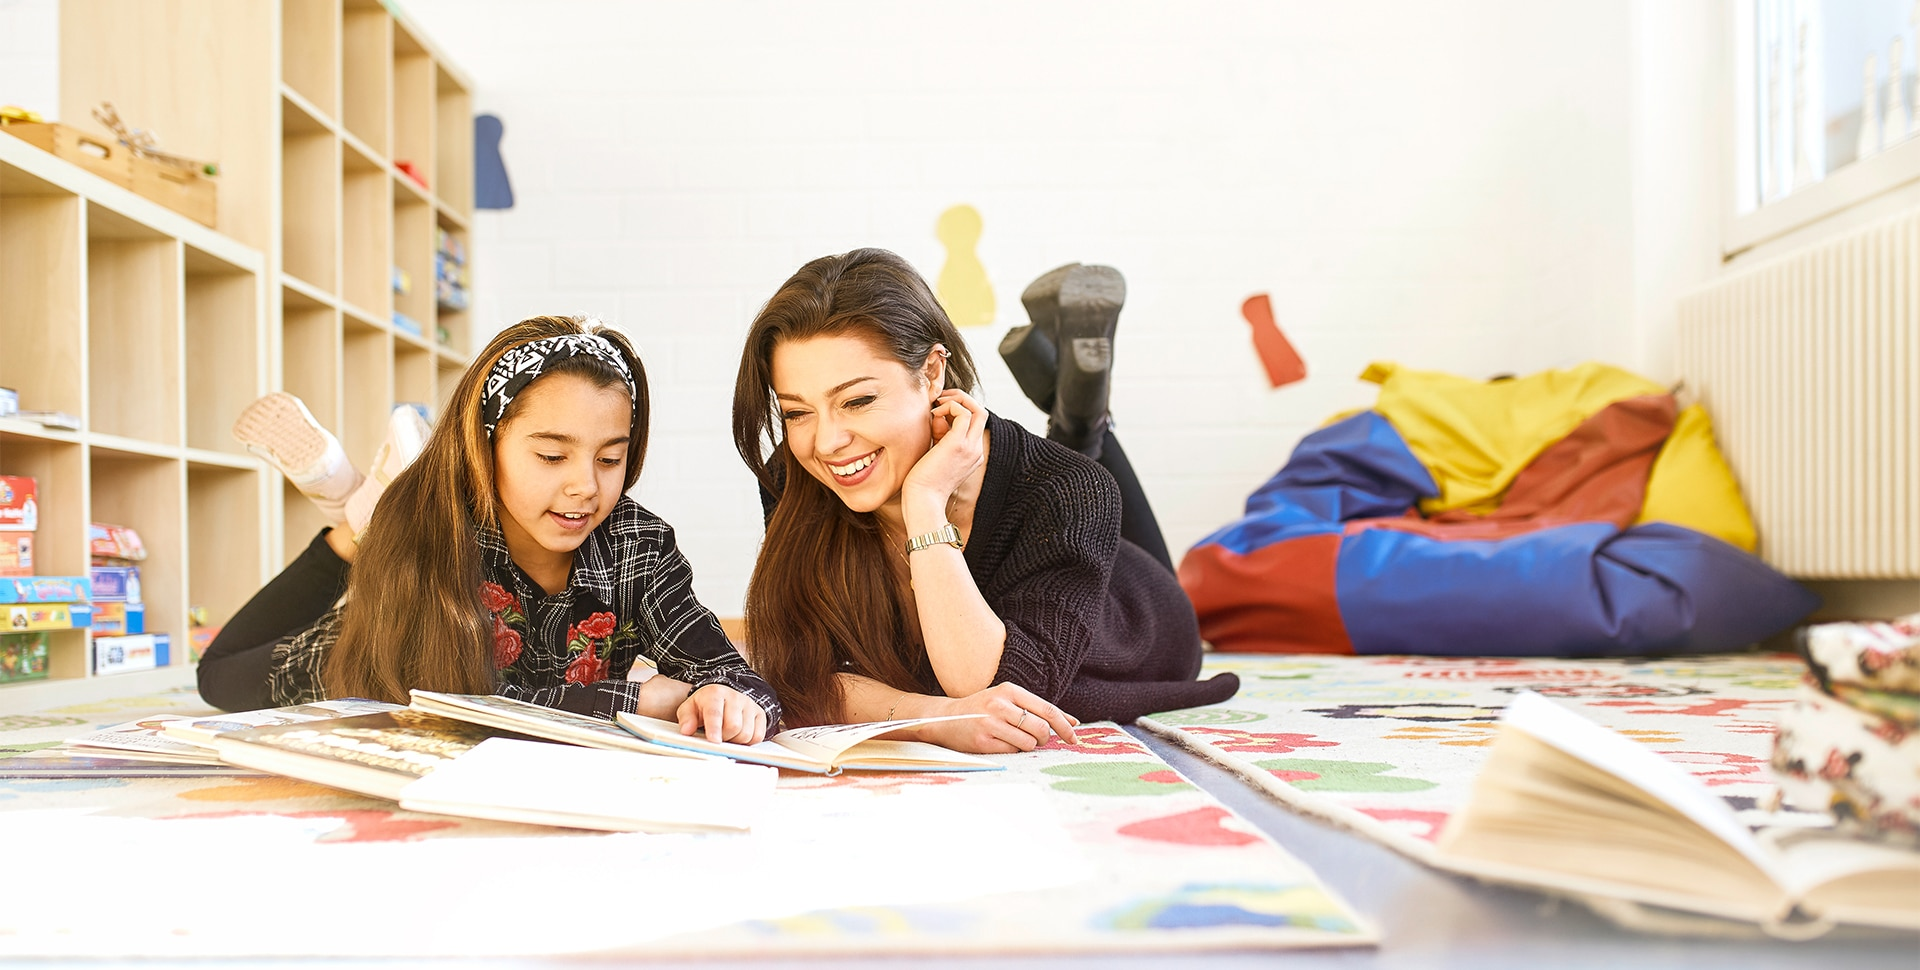 KinderHelden Lesetandem Evaluation